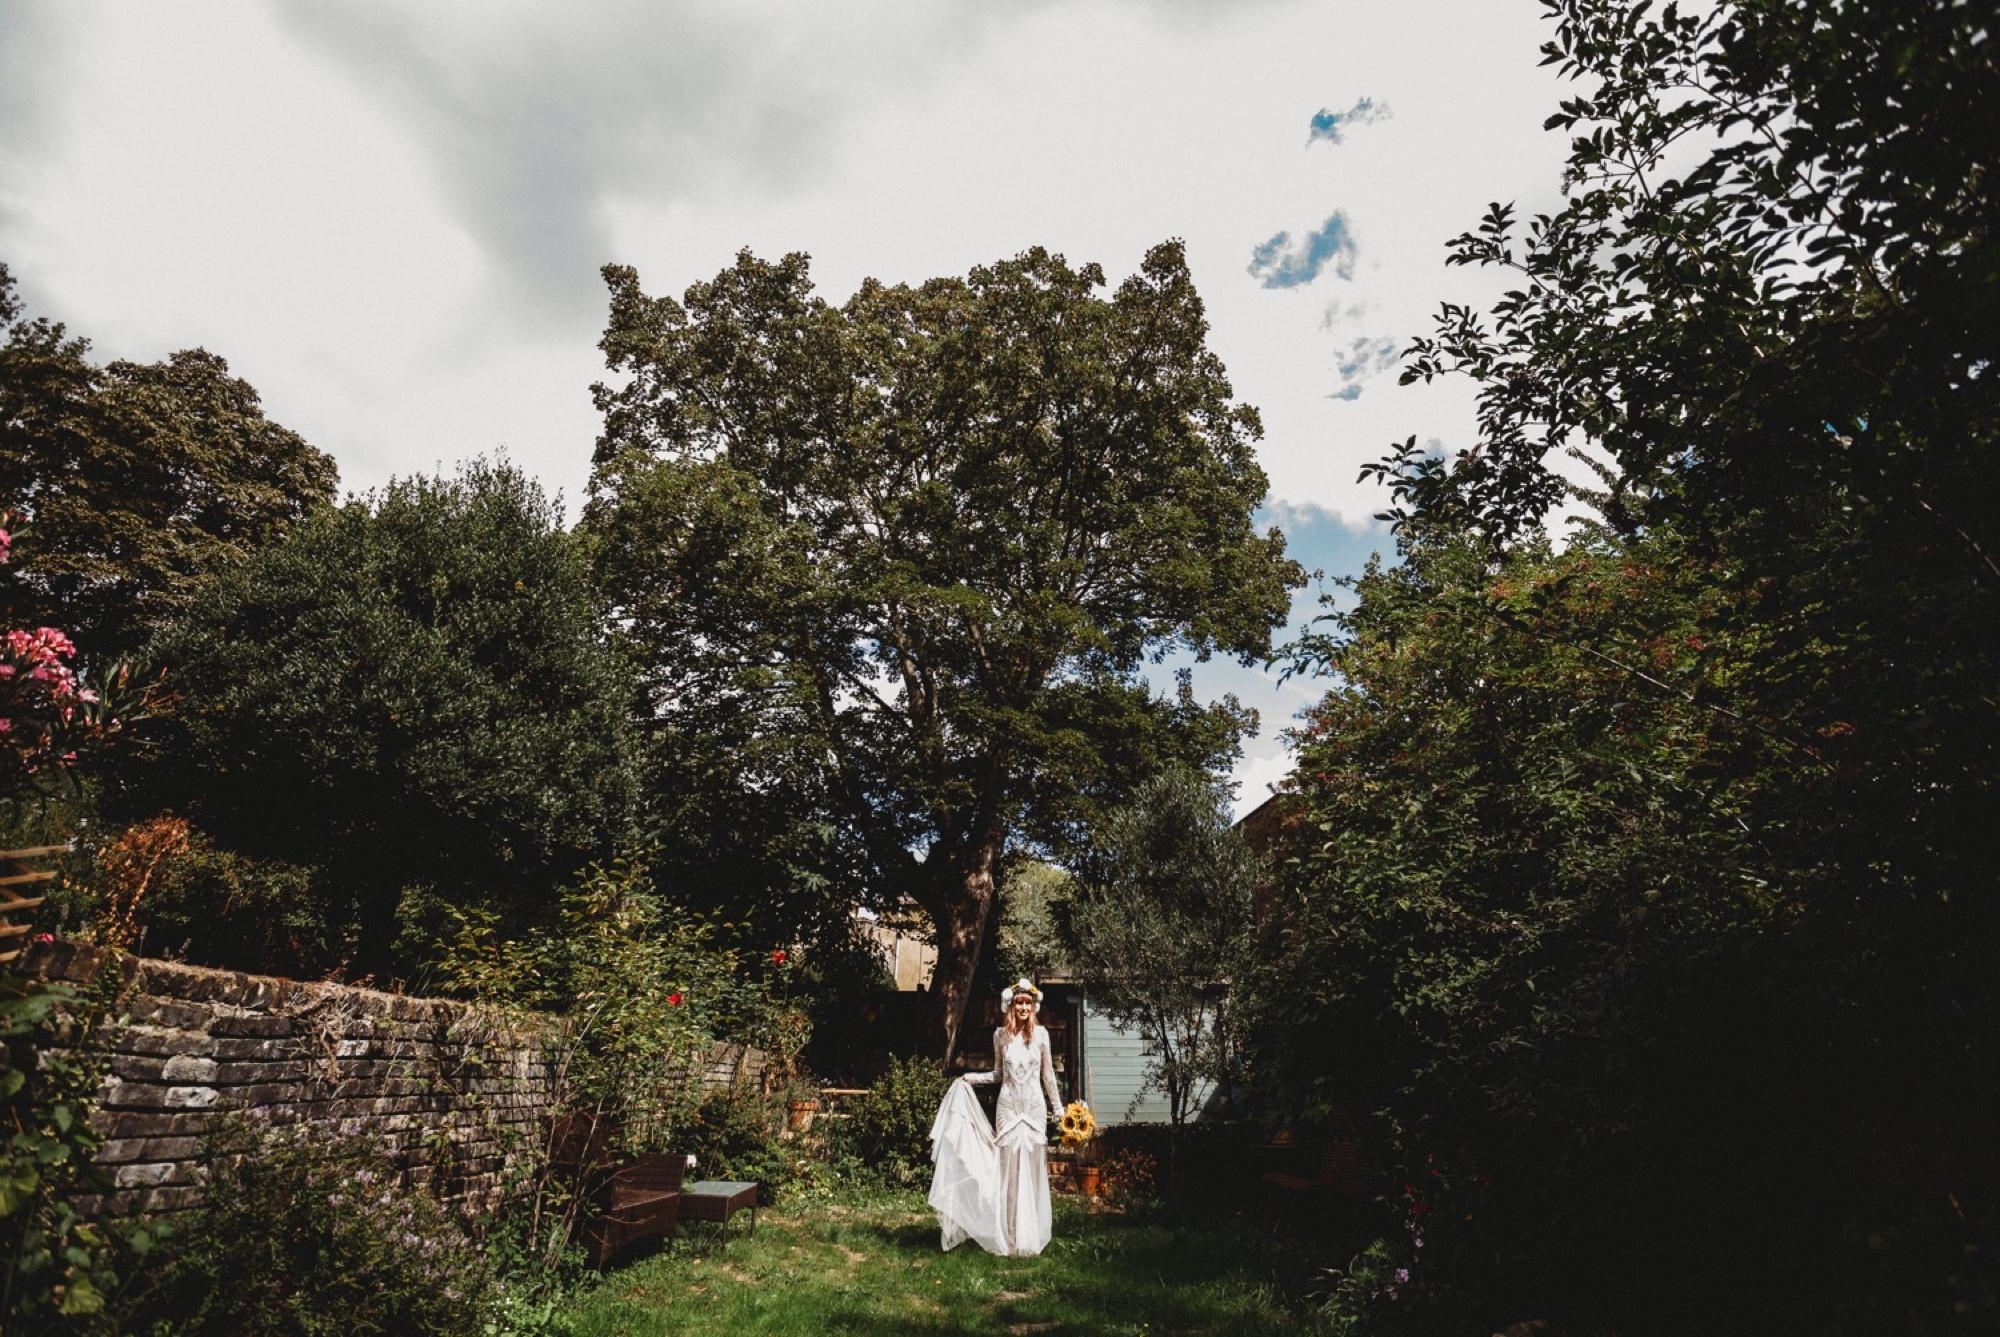 hackney London wedding bride portraits by zakas photography